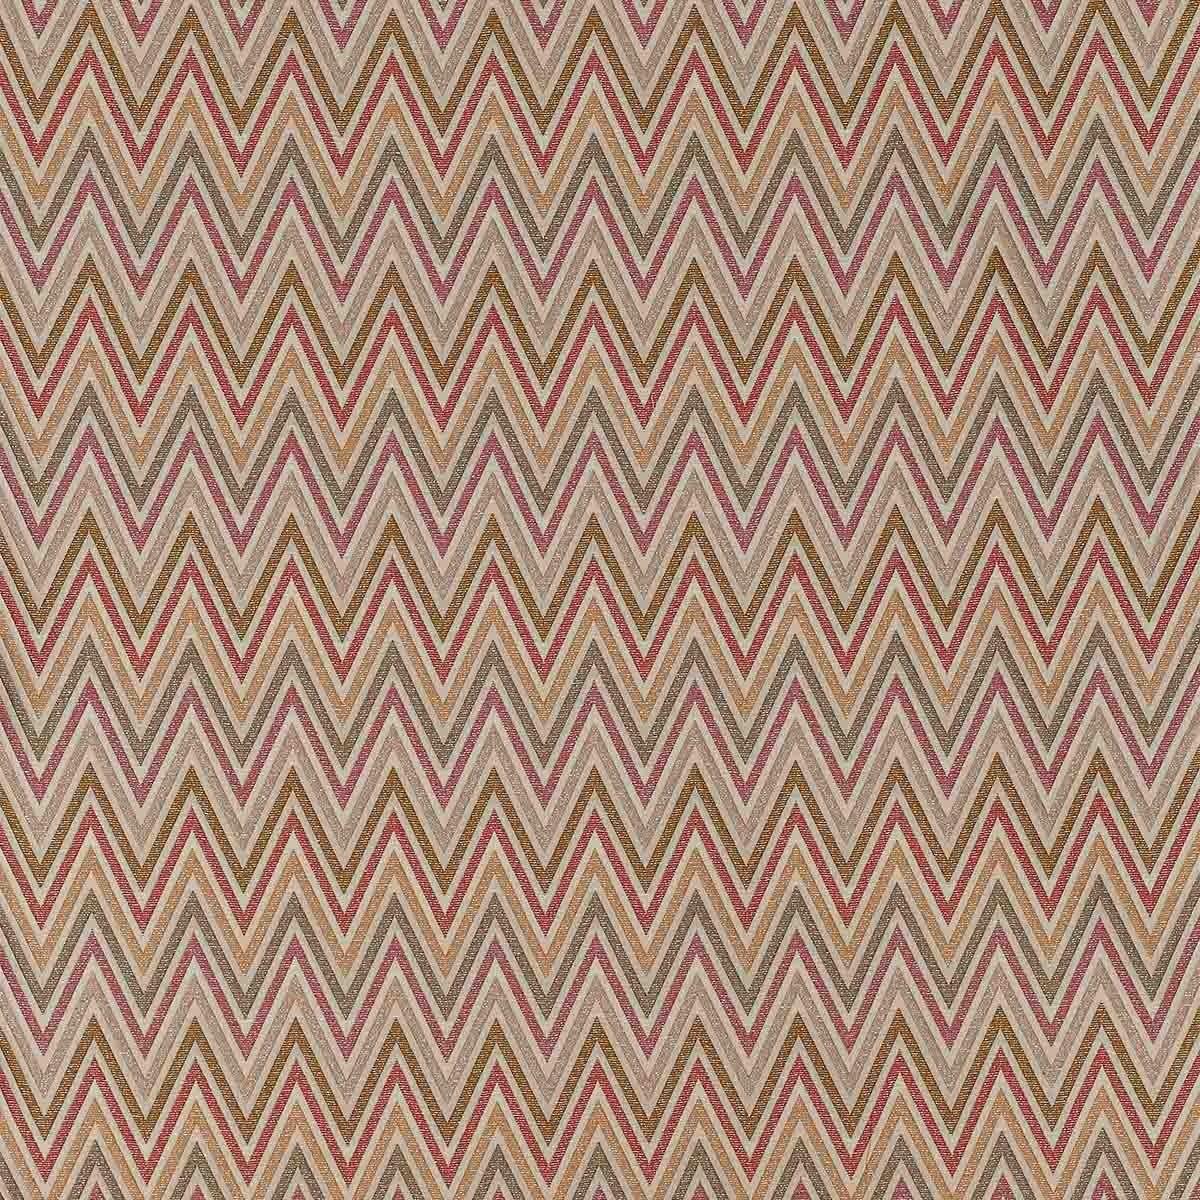 a9b55dc0fc53 Nesterov Fabric - Missoni Home